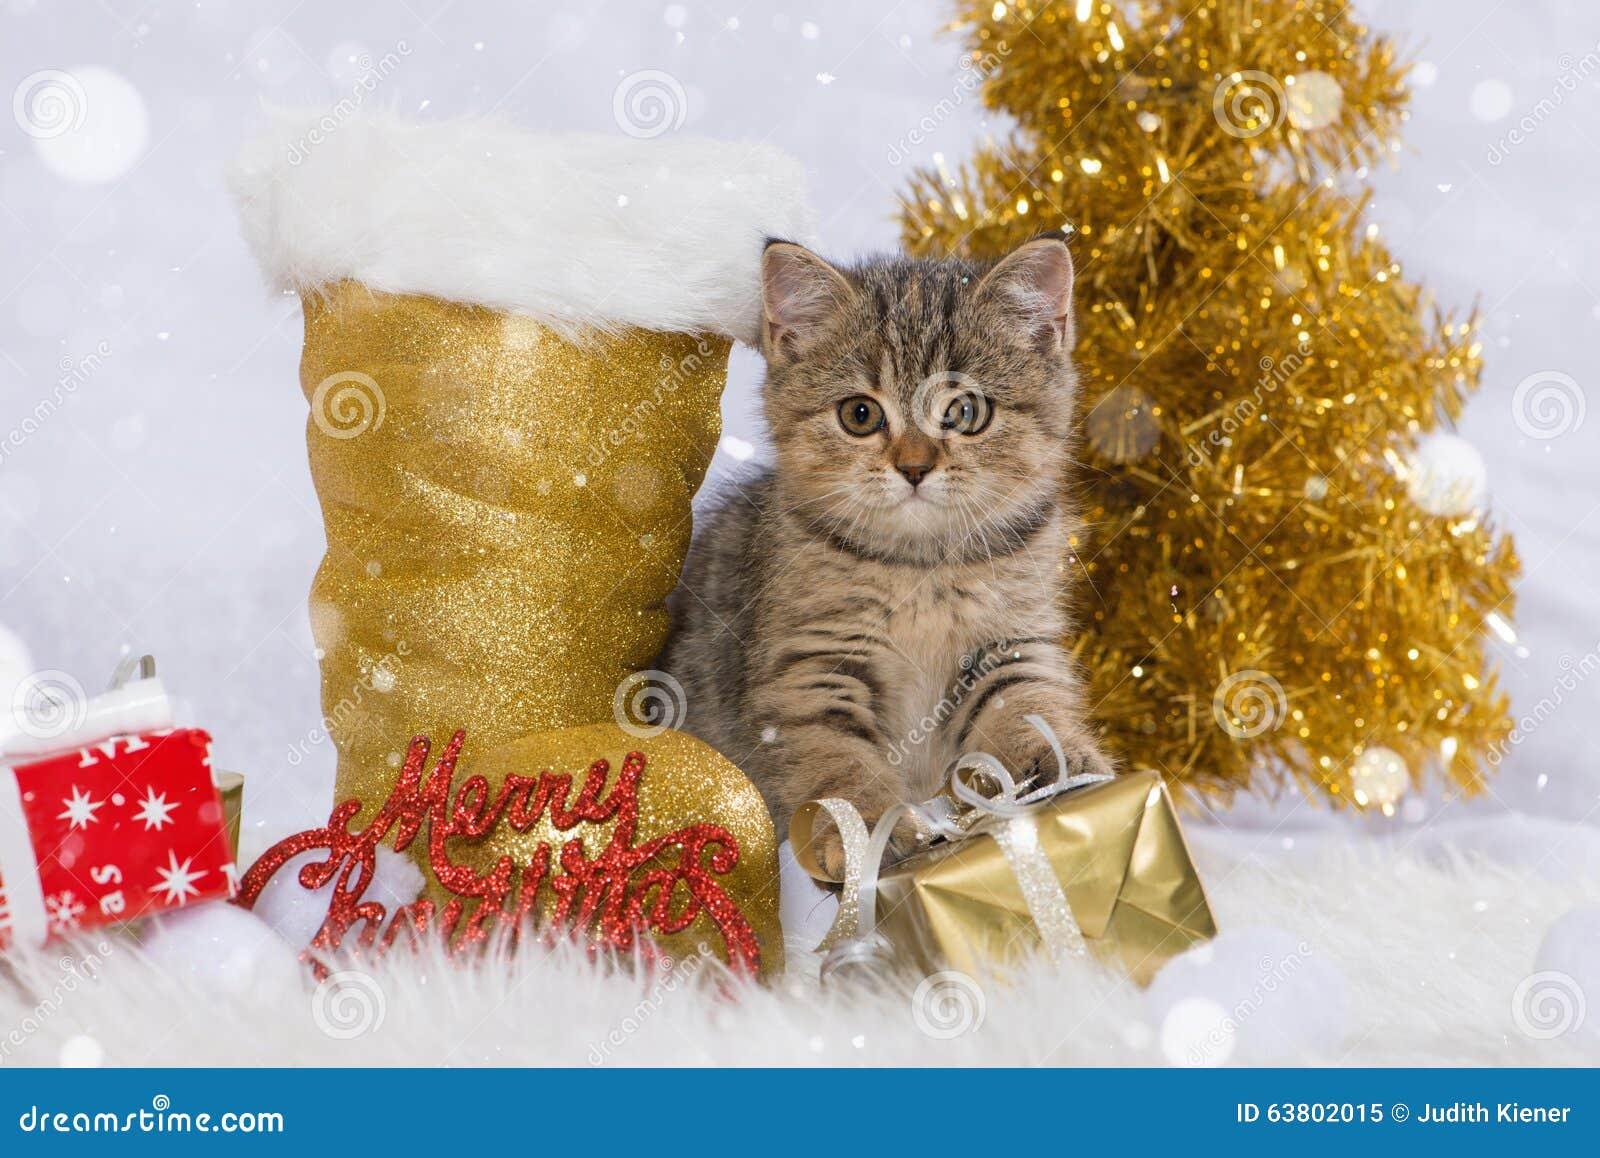 merry christmas cat - Merry Christmas Cat